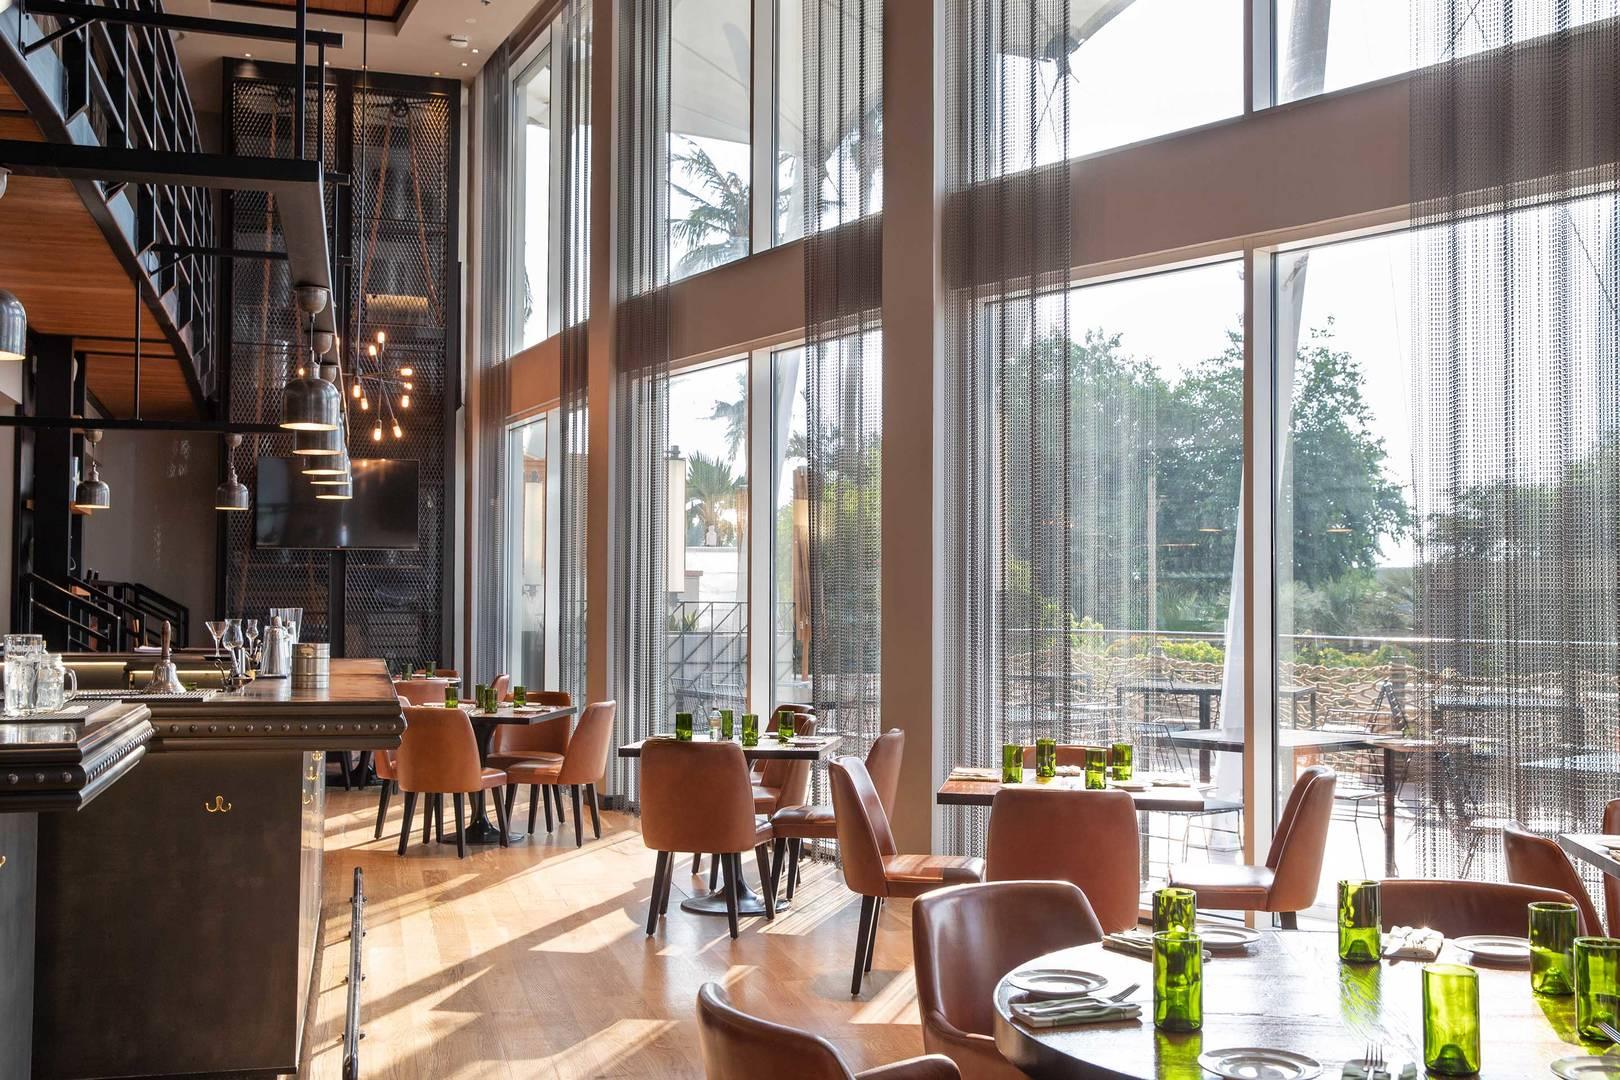 Interior of the D&A Restaurant at Jumeirah Beach Hotel